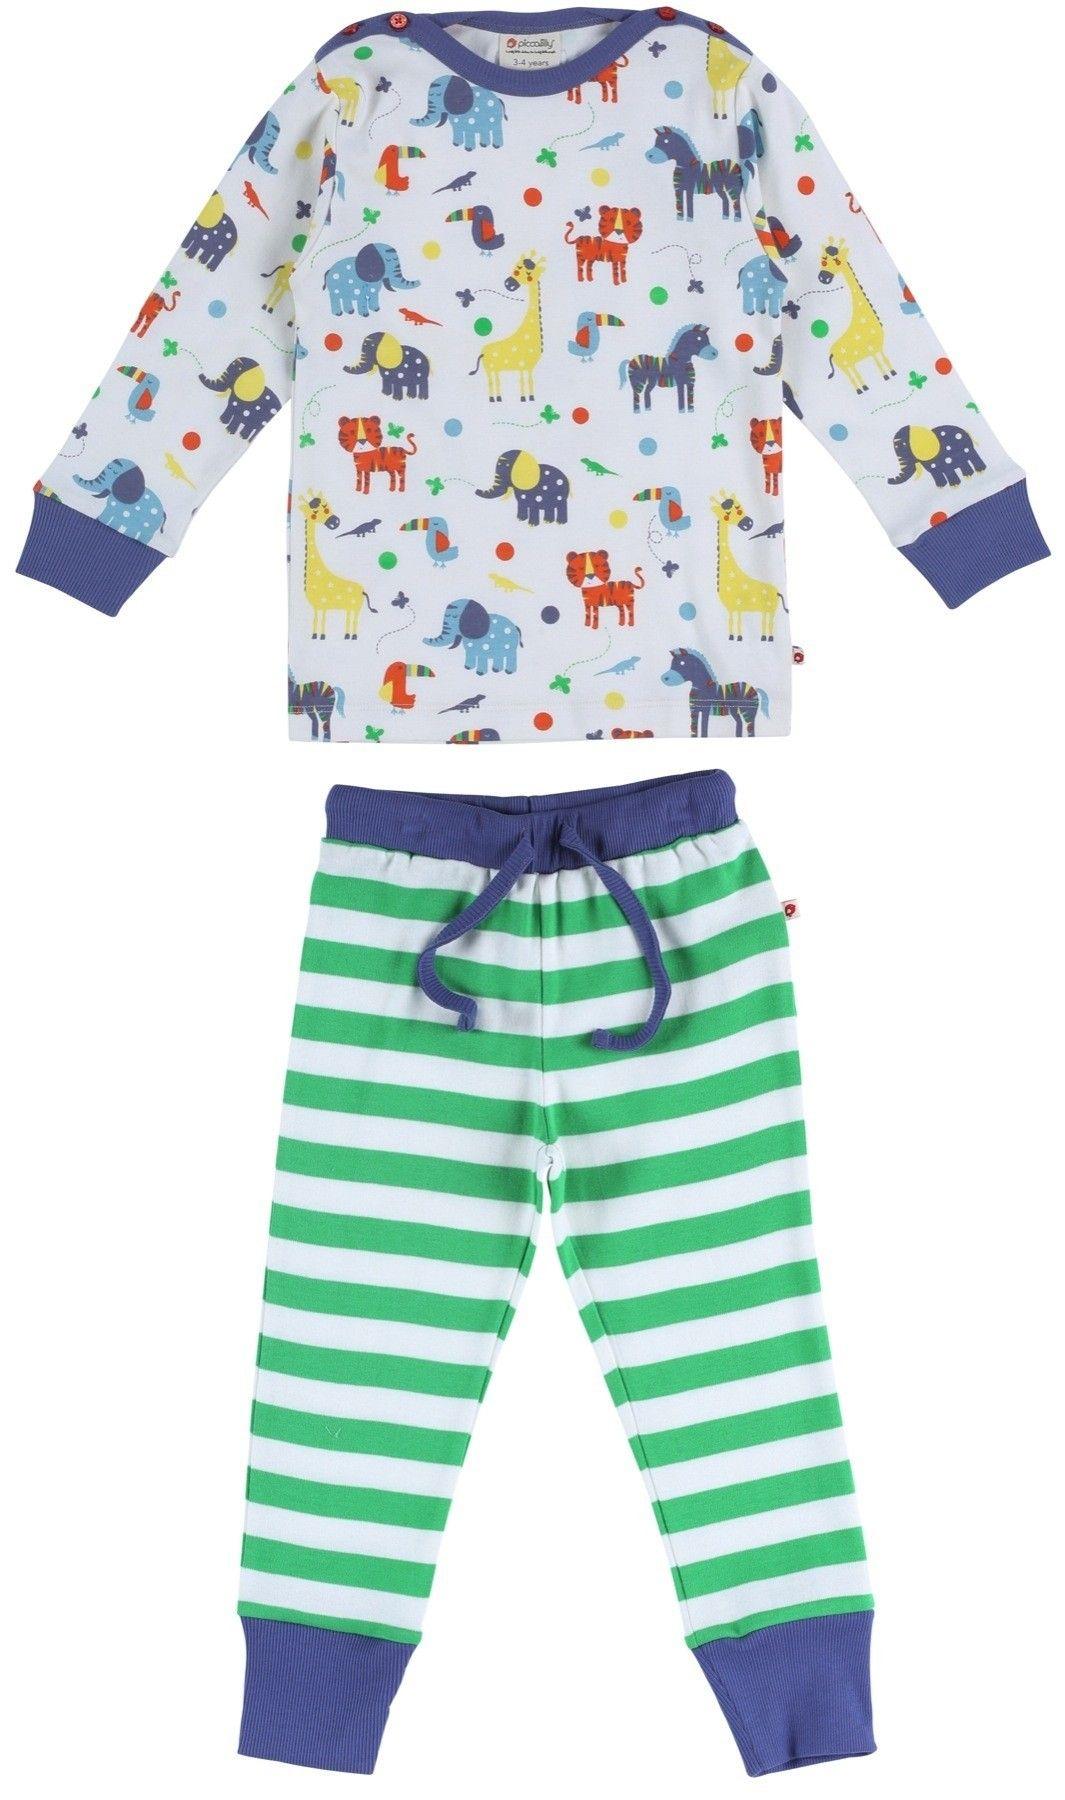 3531d1c8a54a Organic Cotton Boys Pajamas